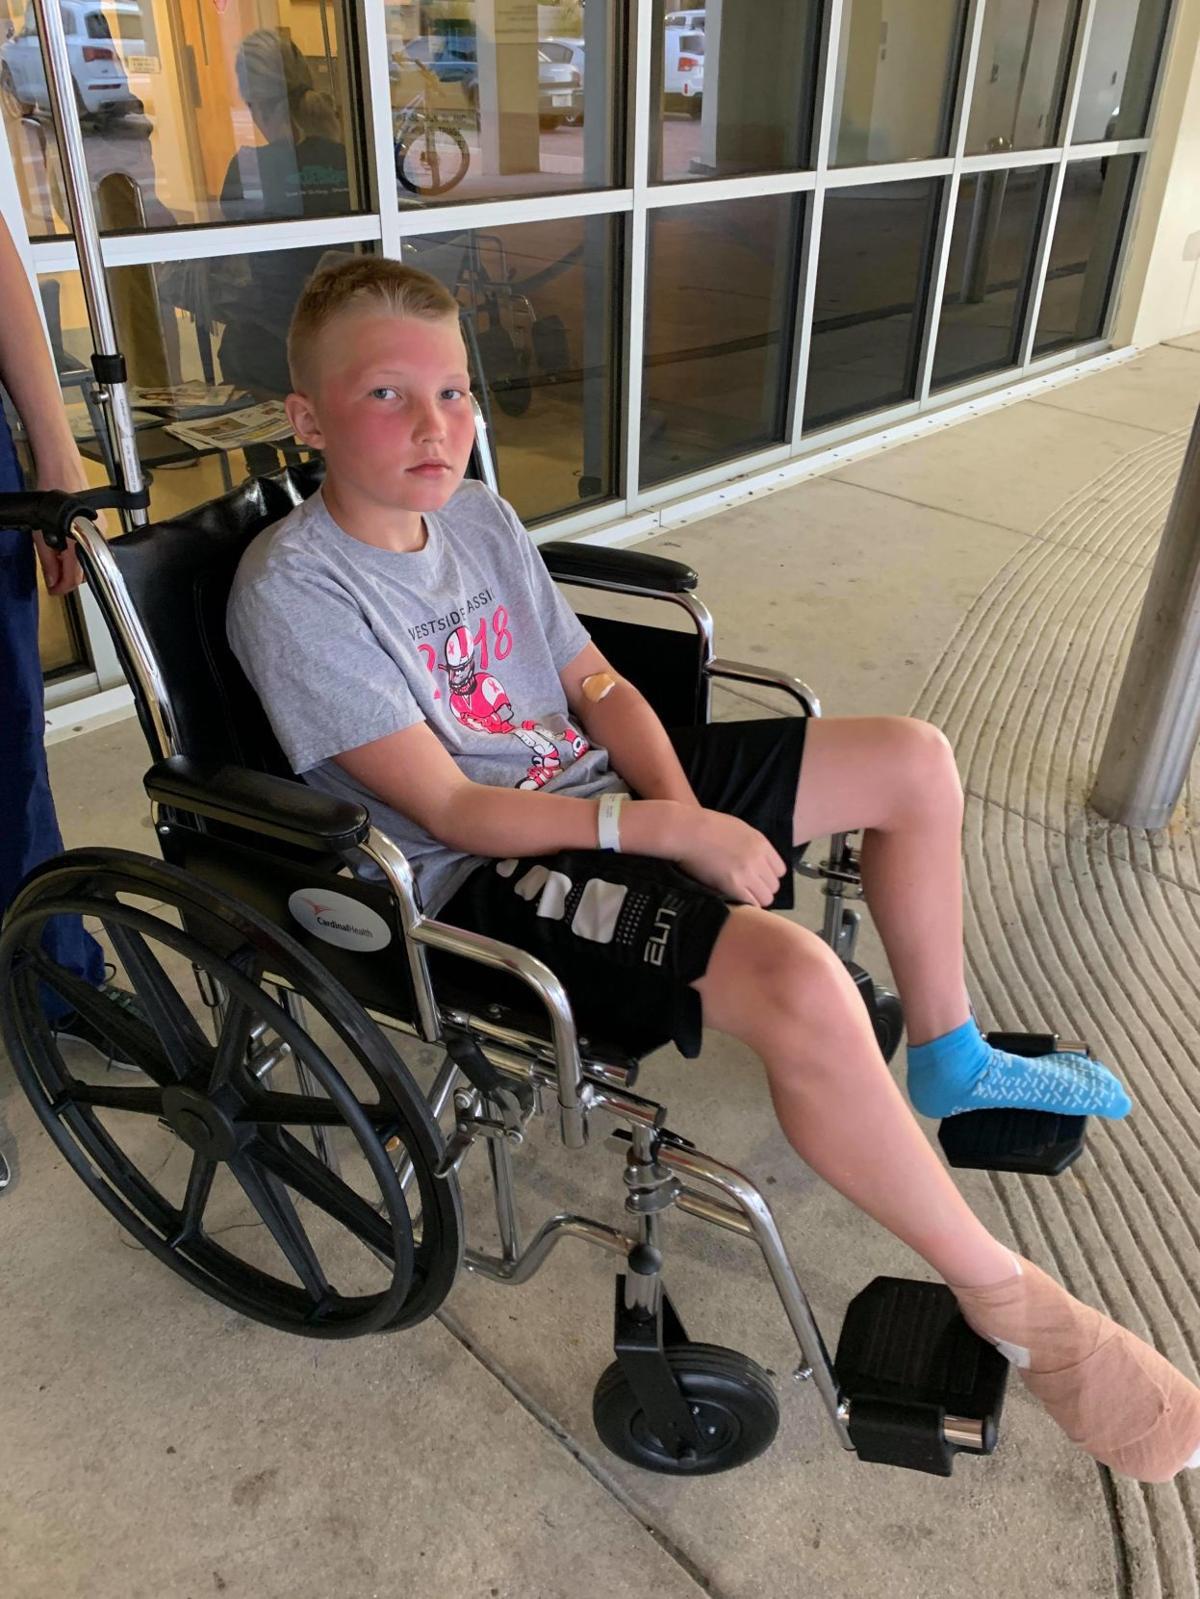 Kael Dewey, 11, after a Florida shark attack